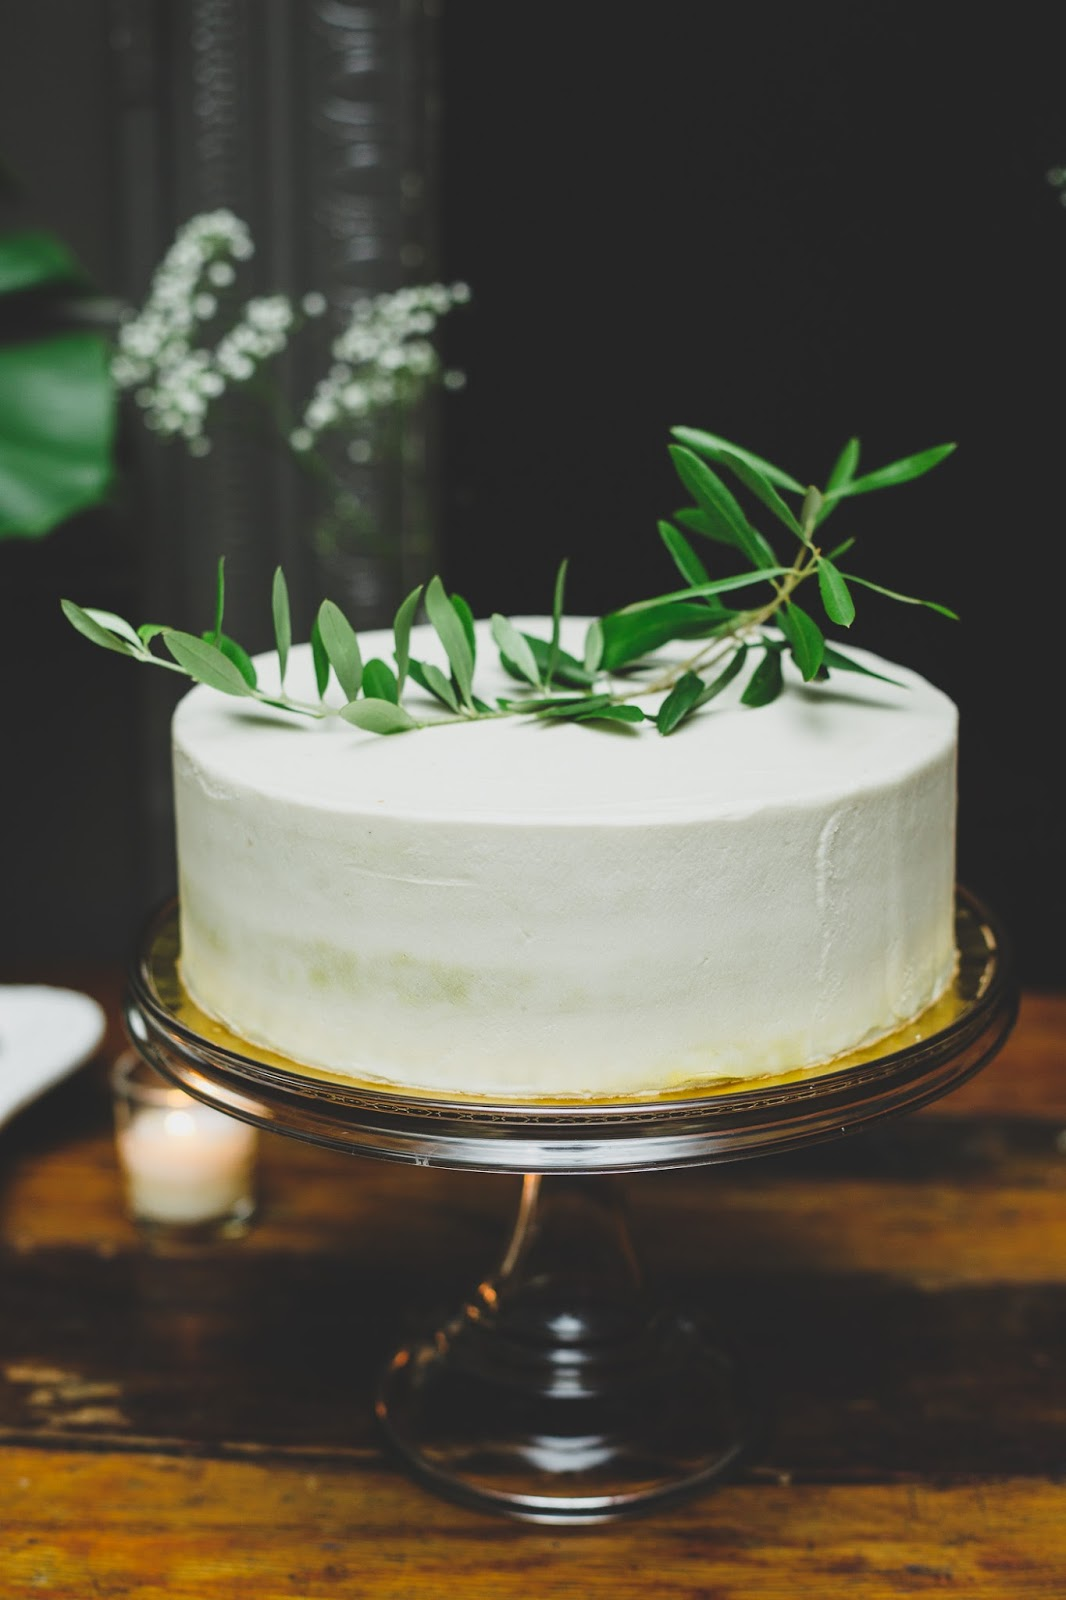 Sweet Maresa's NYC vegan wedding cake   Documentary Wedding Photography - blog.cassiecastellaw.com